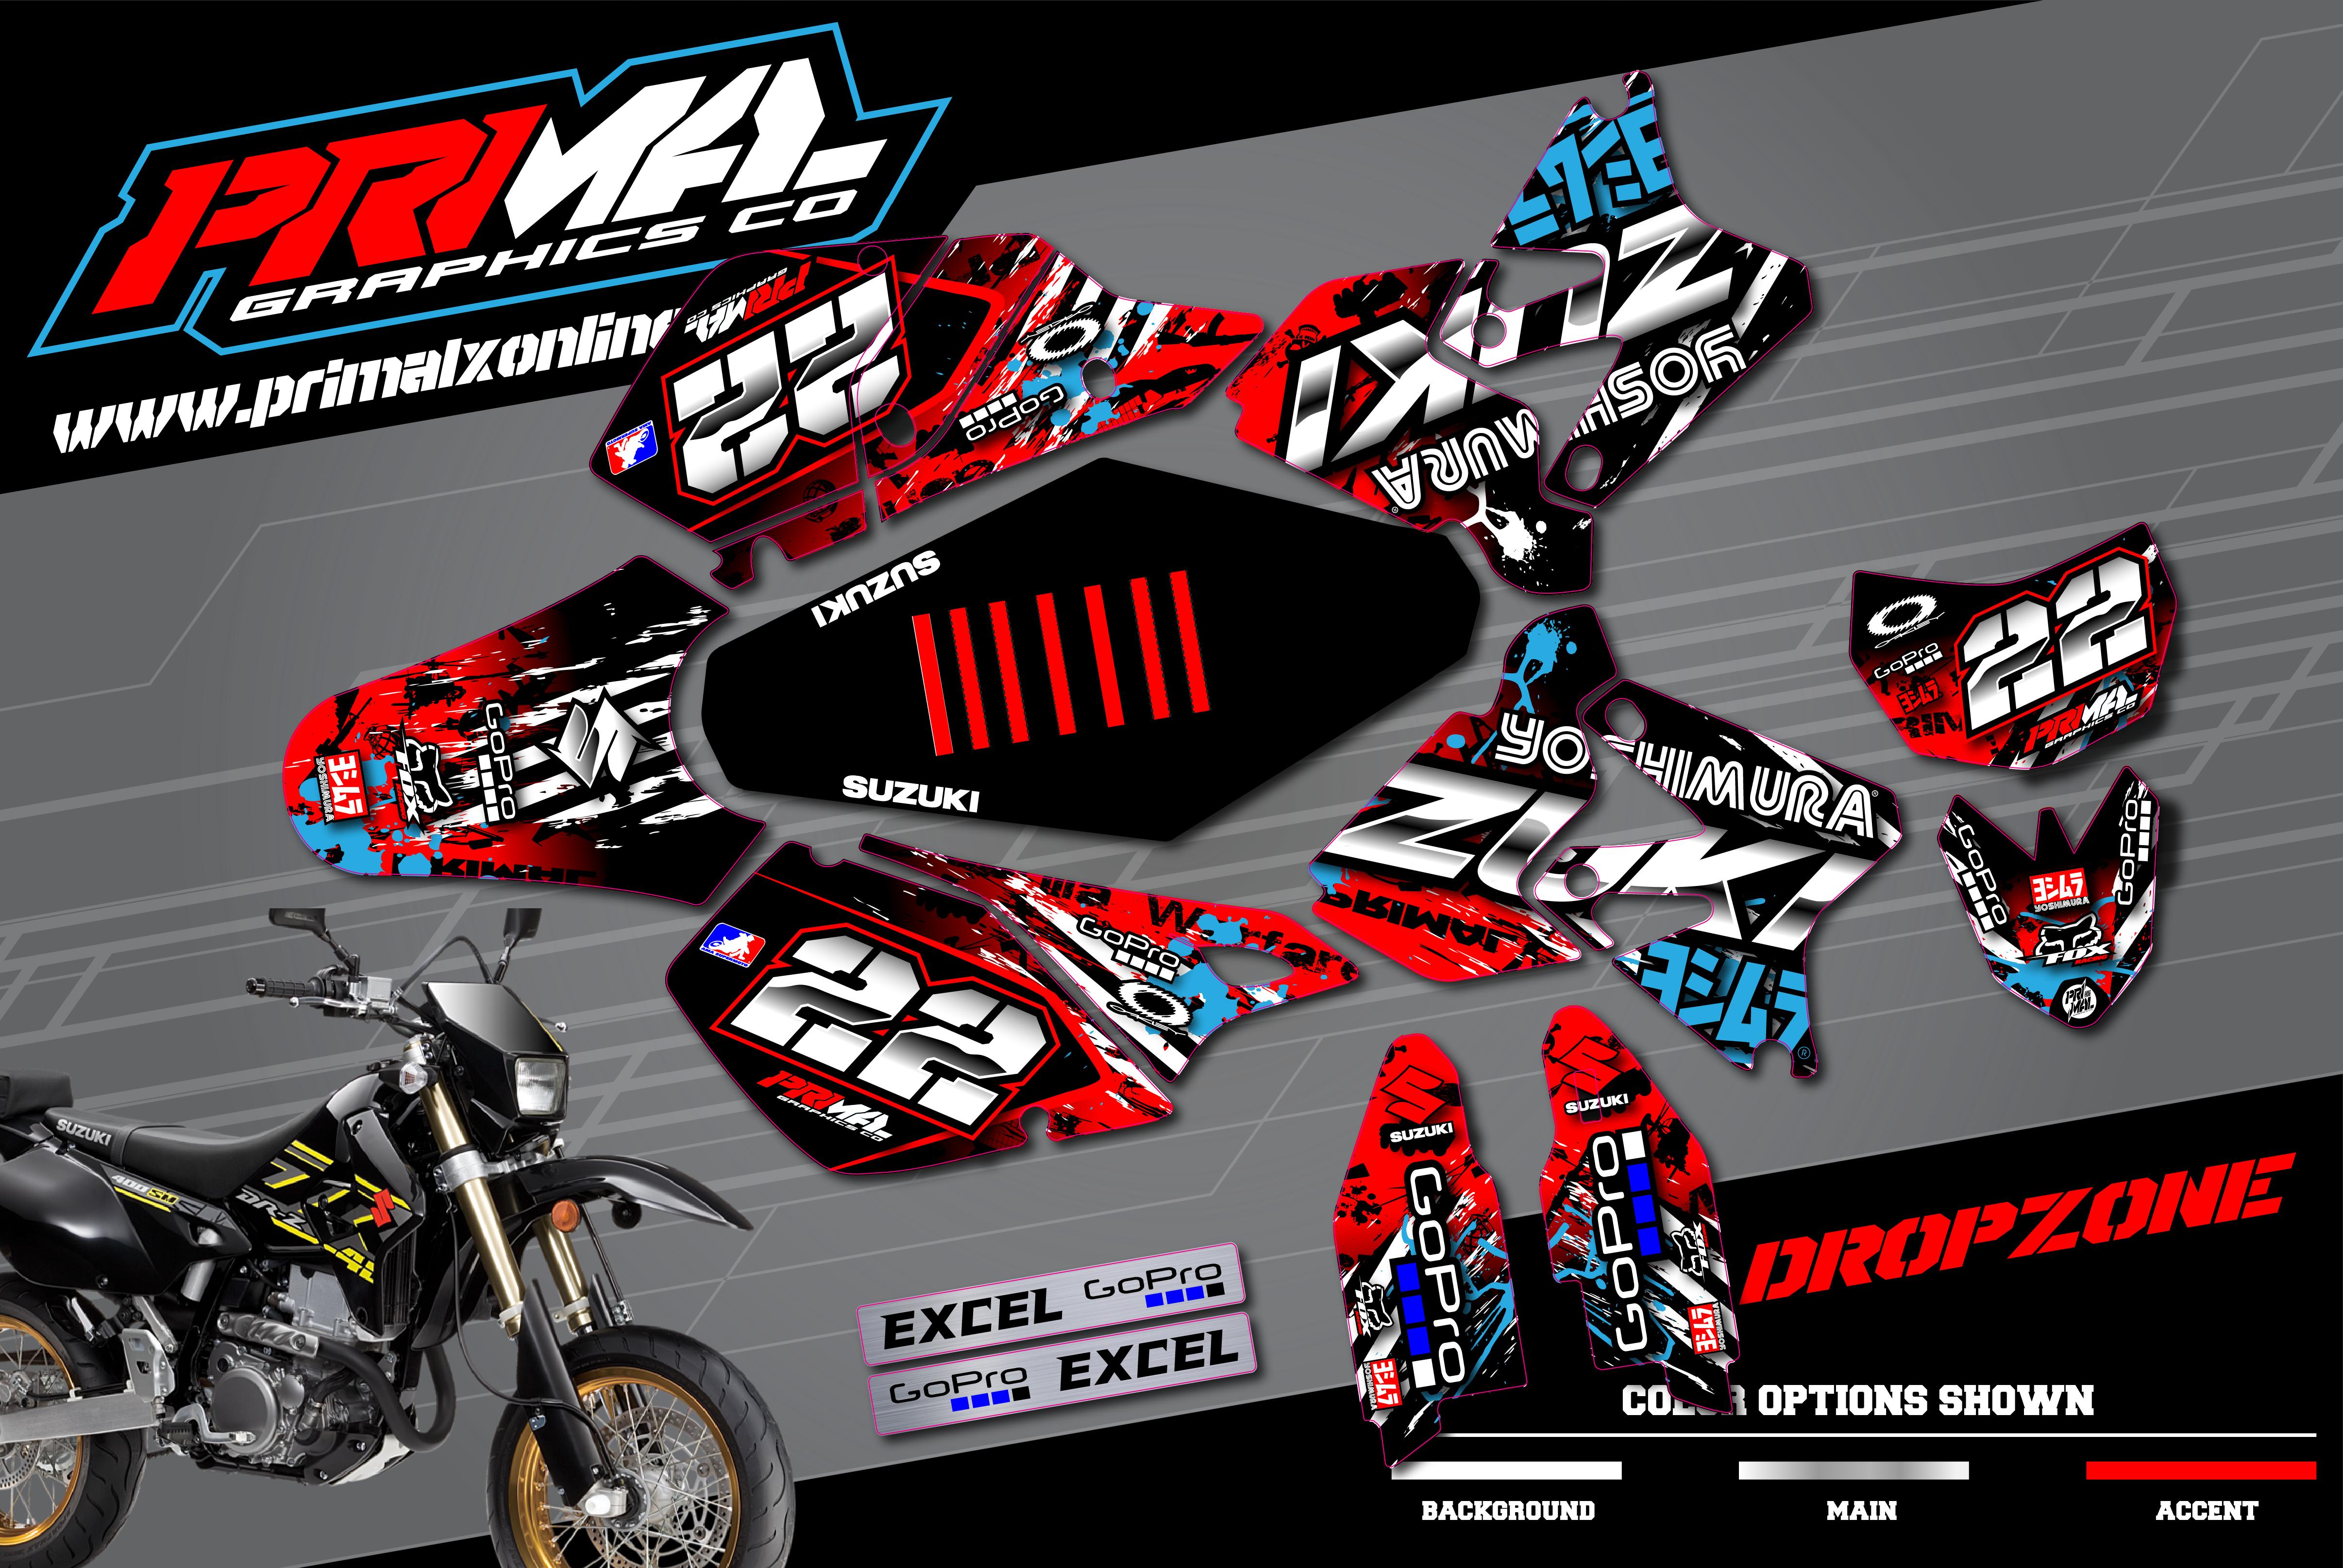 1_PRIMAL-X-MOTORSPORTS-PRIMAL-GRAPHICS-CO-SUZUKI-DRZ400SM-SUPERMOTO-MOTOCROSS-GRAPHICS-BIKELIFE-CHARMCITY-DROPZONE-PEREZ-01